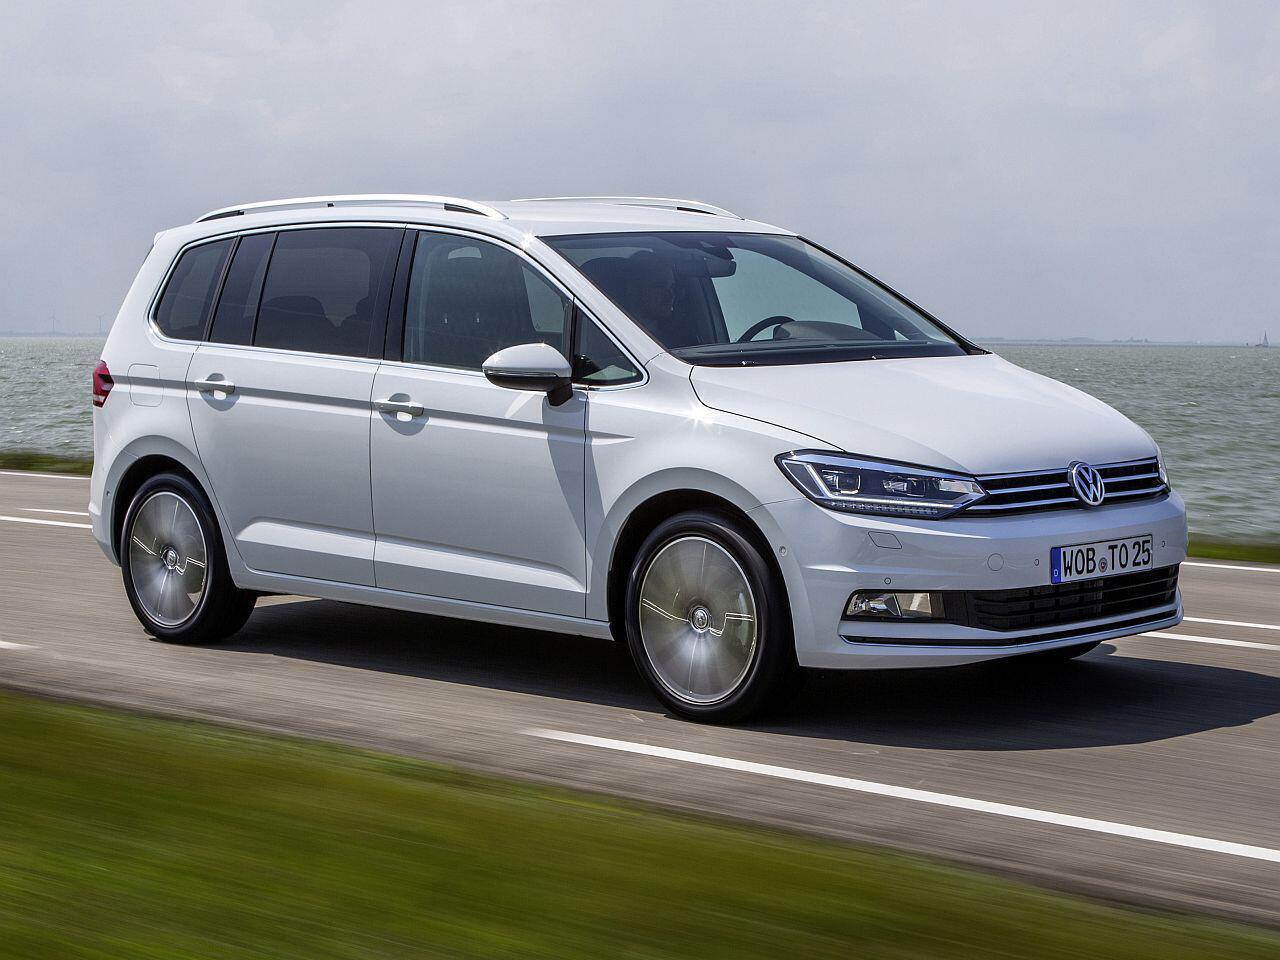 Bild zu Großraum-Vans: VW Touran